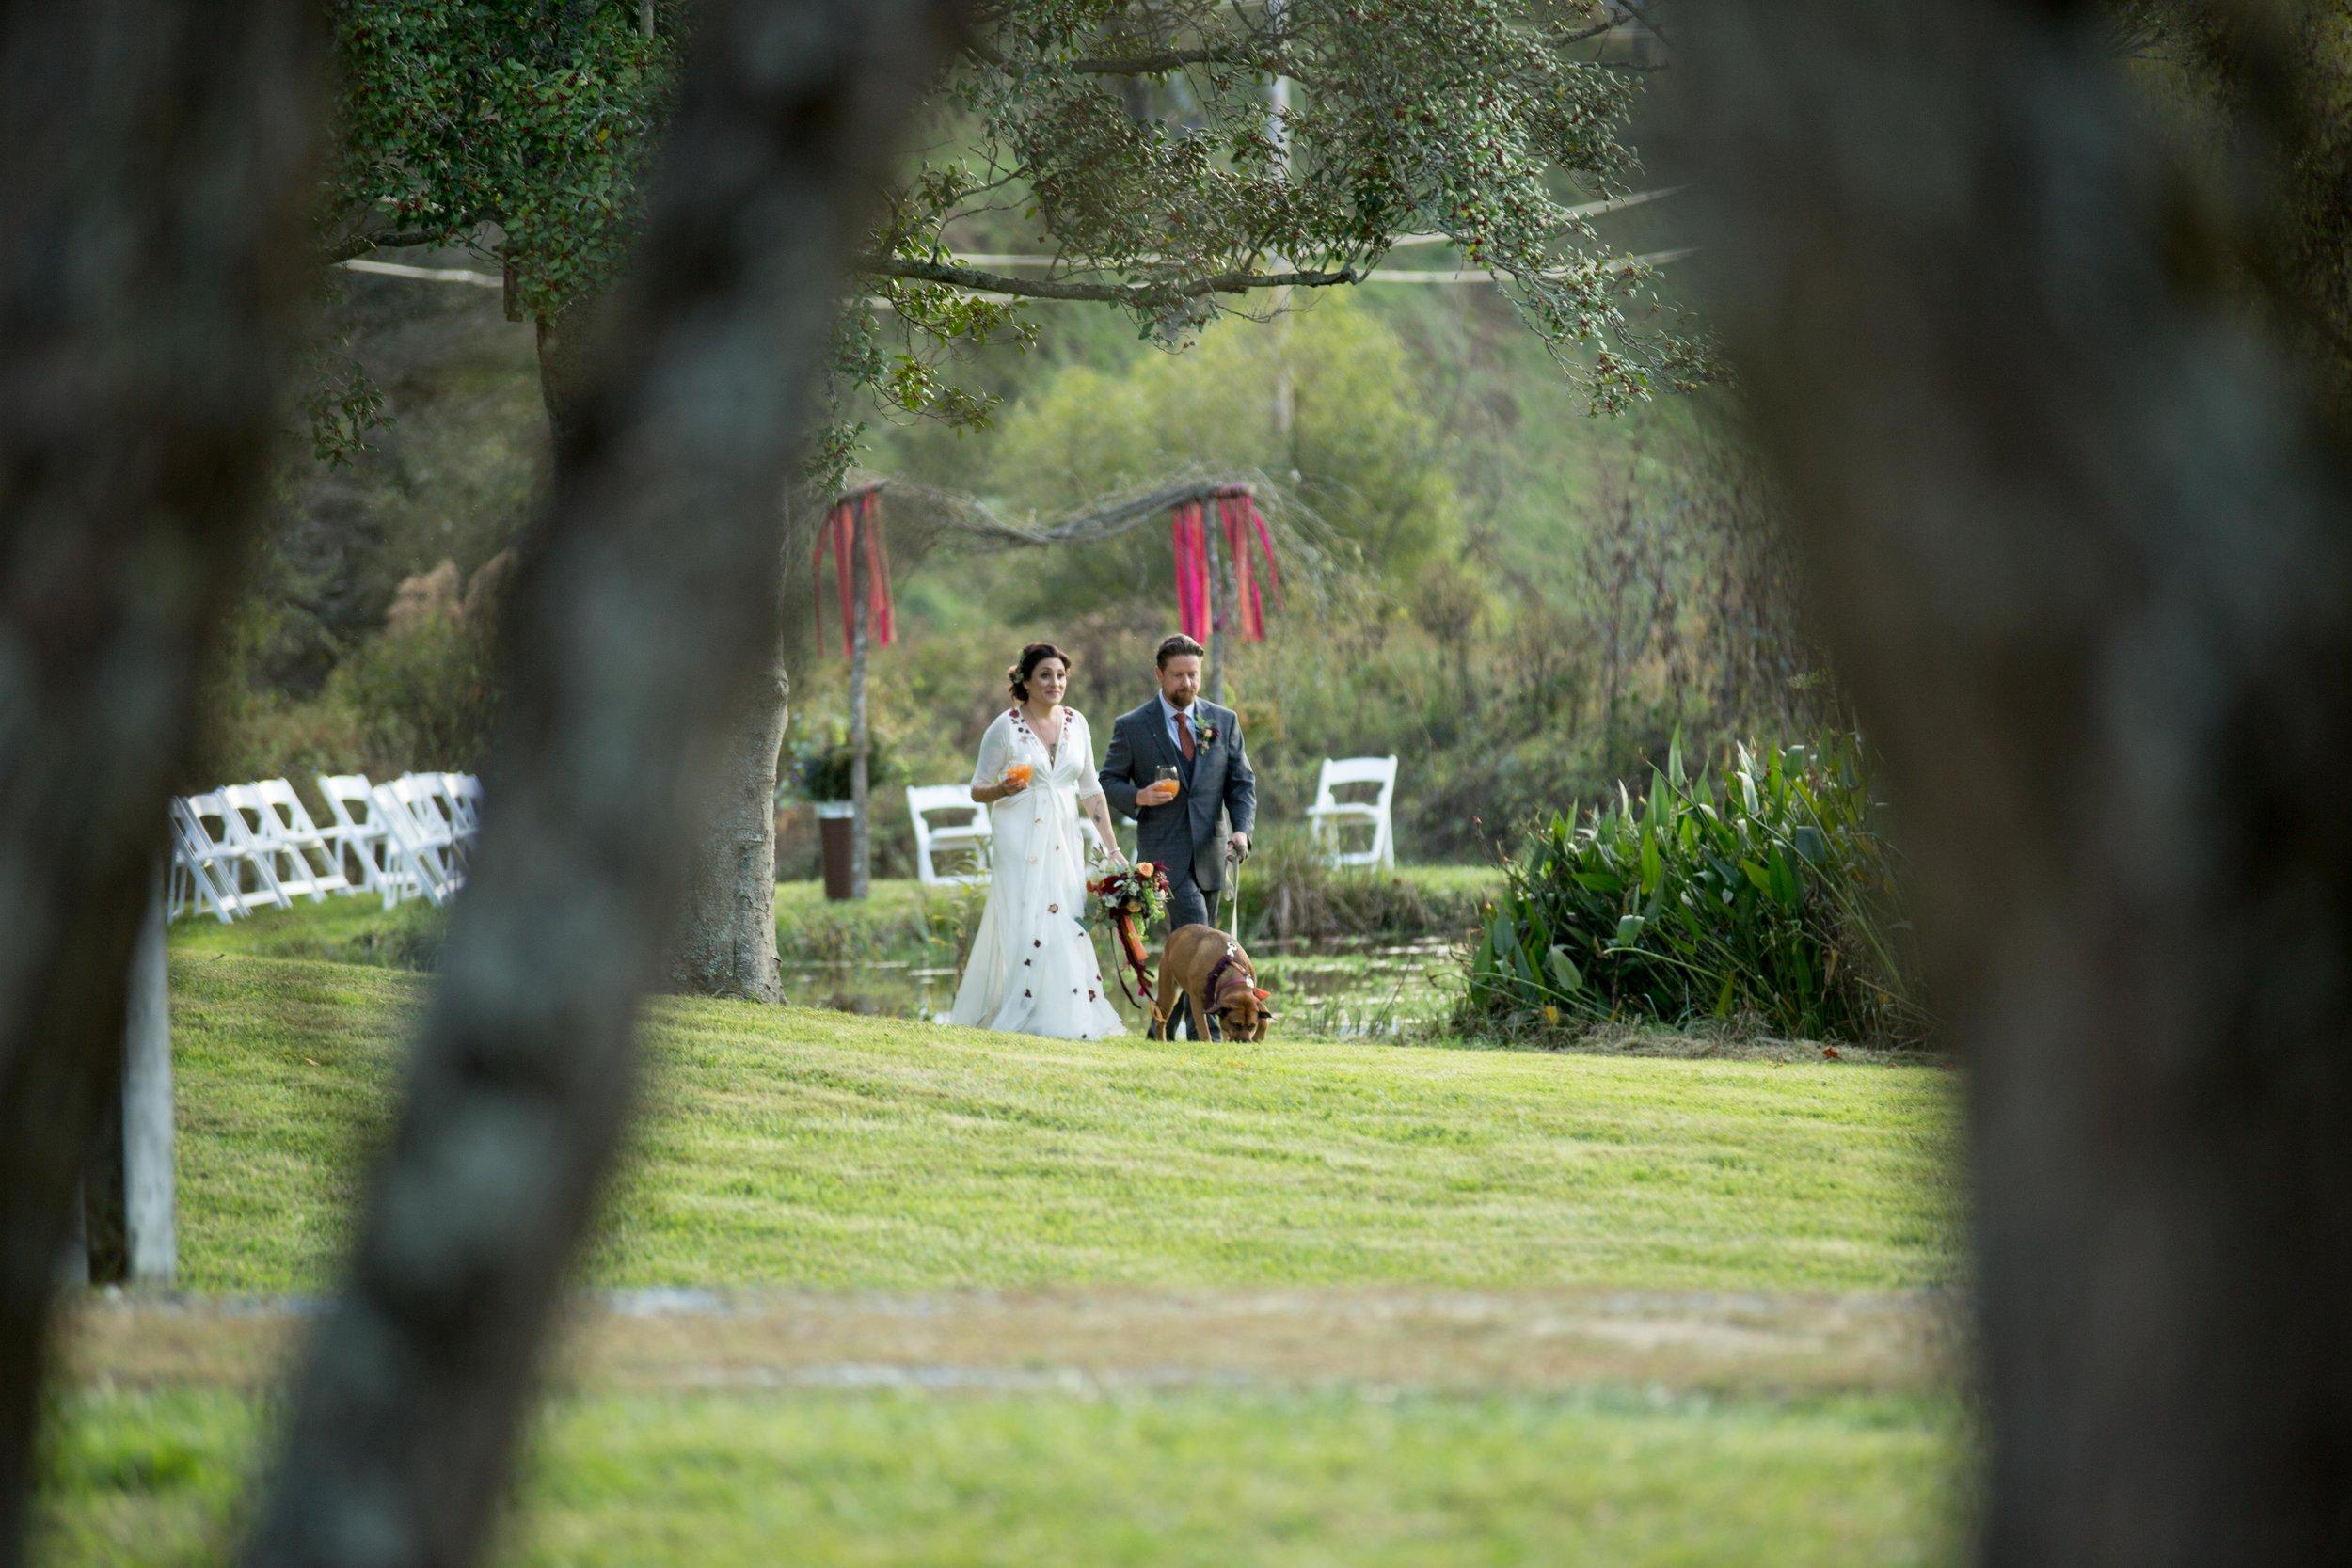 Jane Kramer + Jason Sandford Ashevegas wedding best photographer WNC -64.jpg